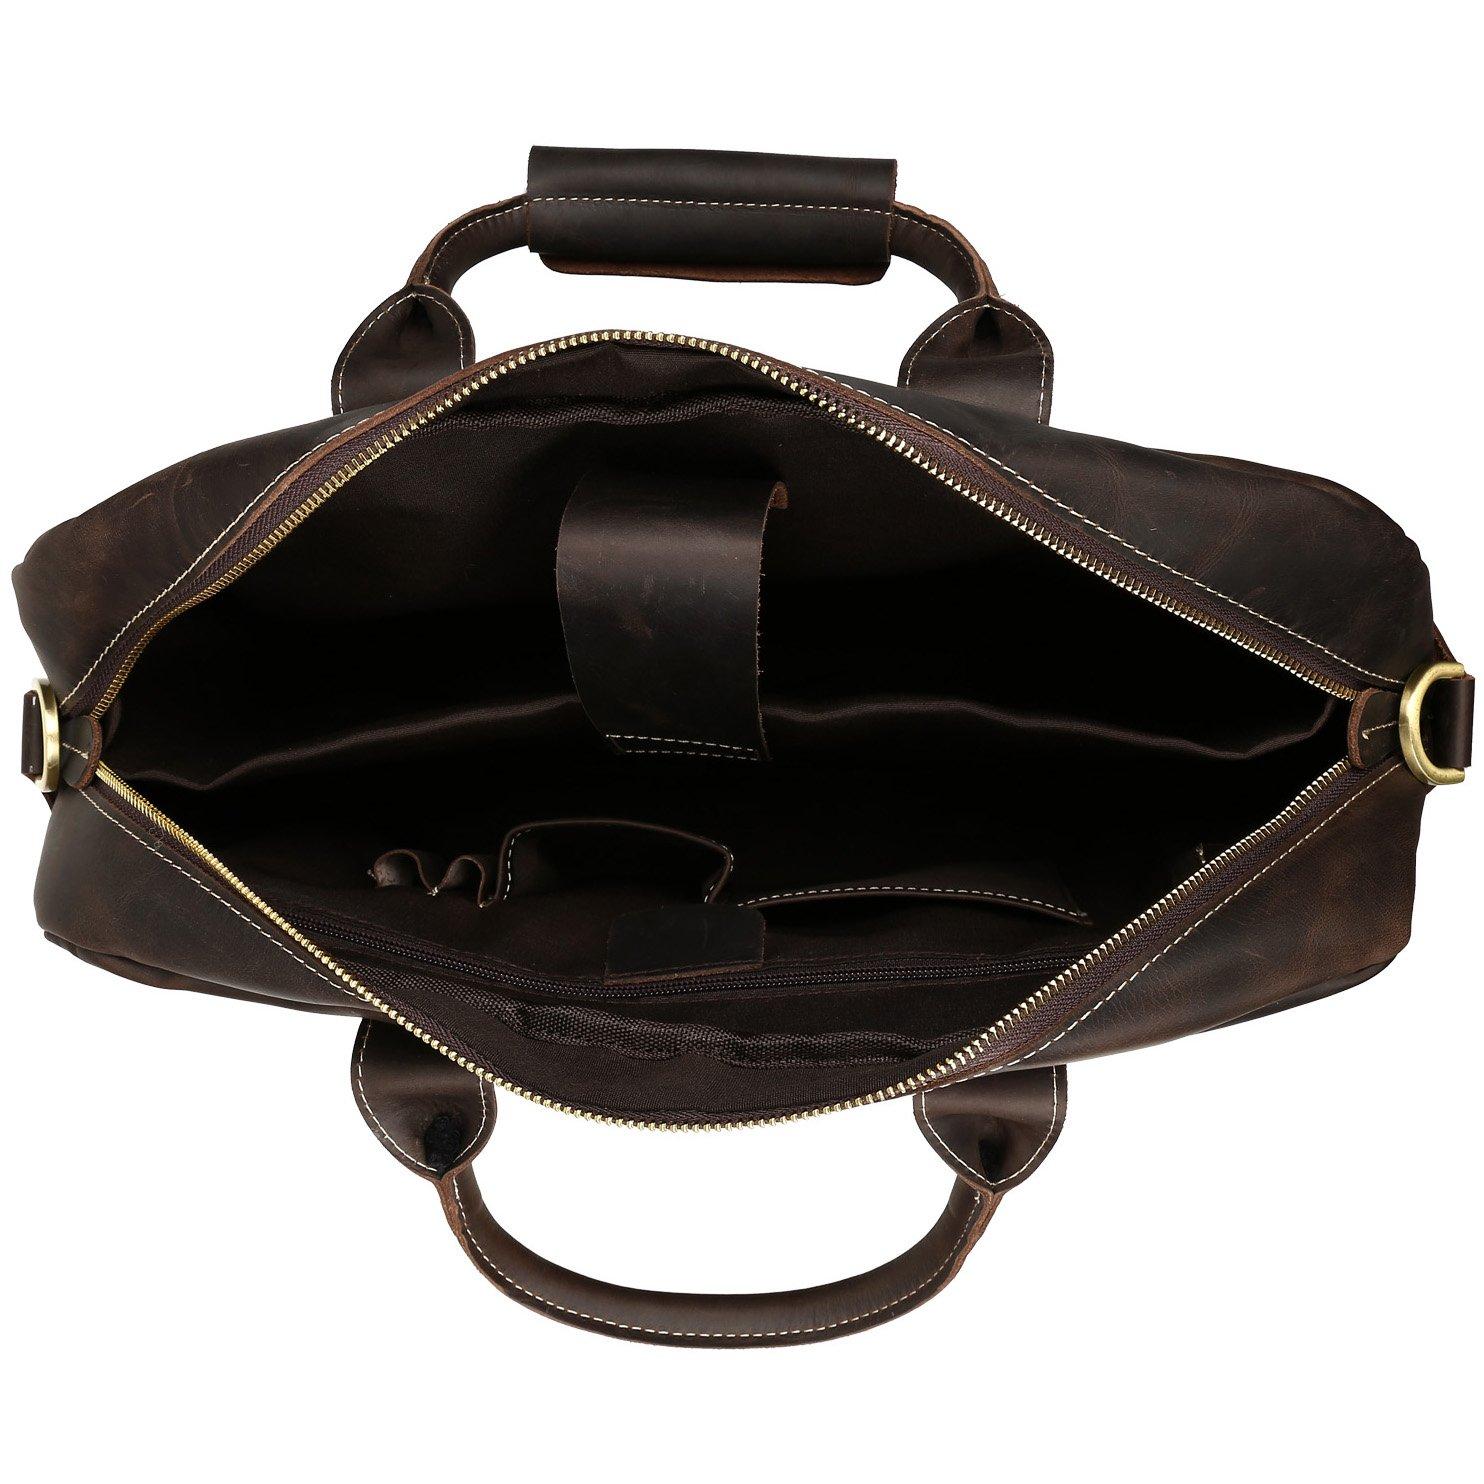 BAIGIO Men Retro Leather Briefcase Laptop Computer Office Business Shoulder Tote Messenger Bag (Dark Brown) by BAIGIO (Image #4)